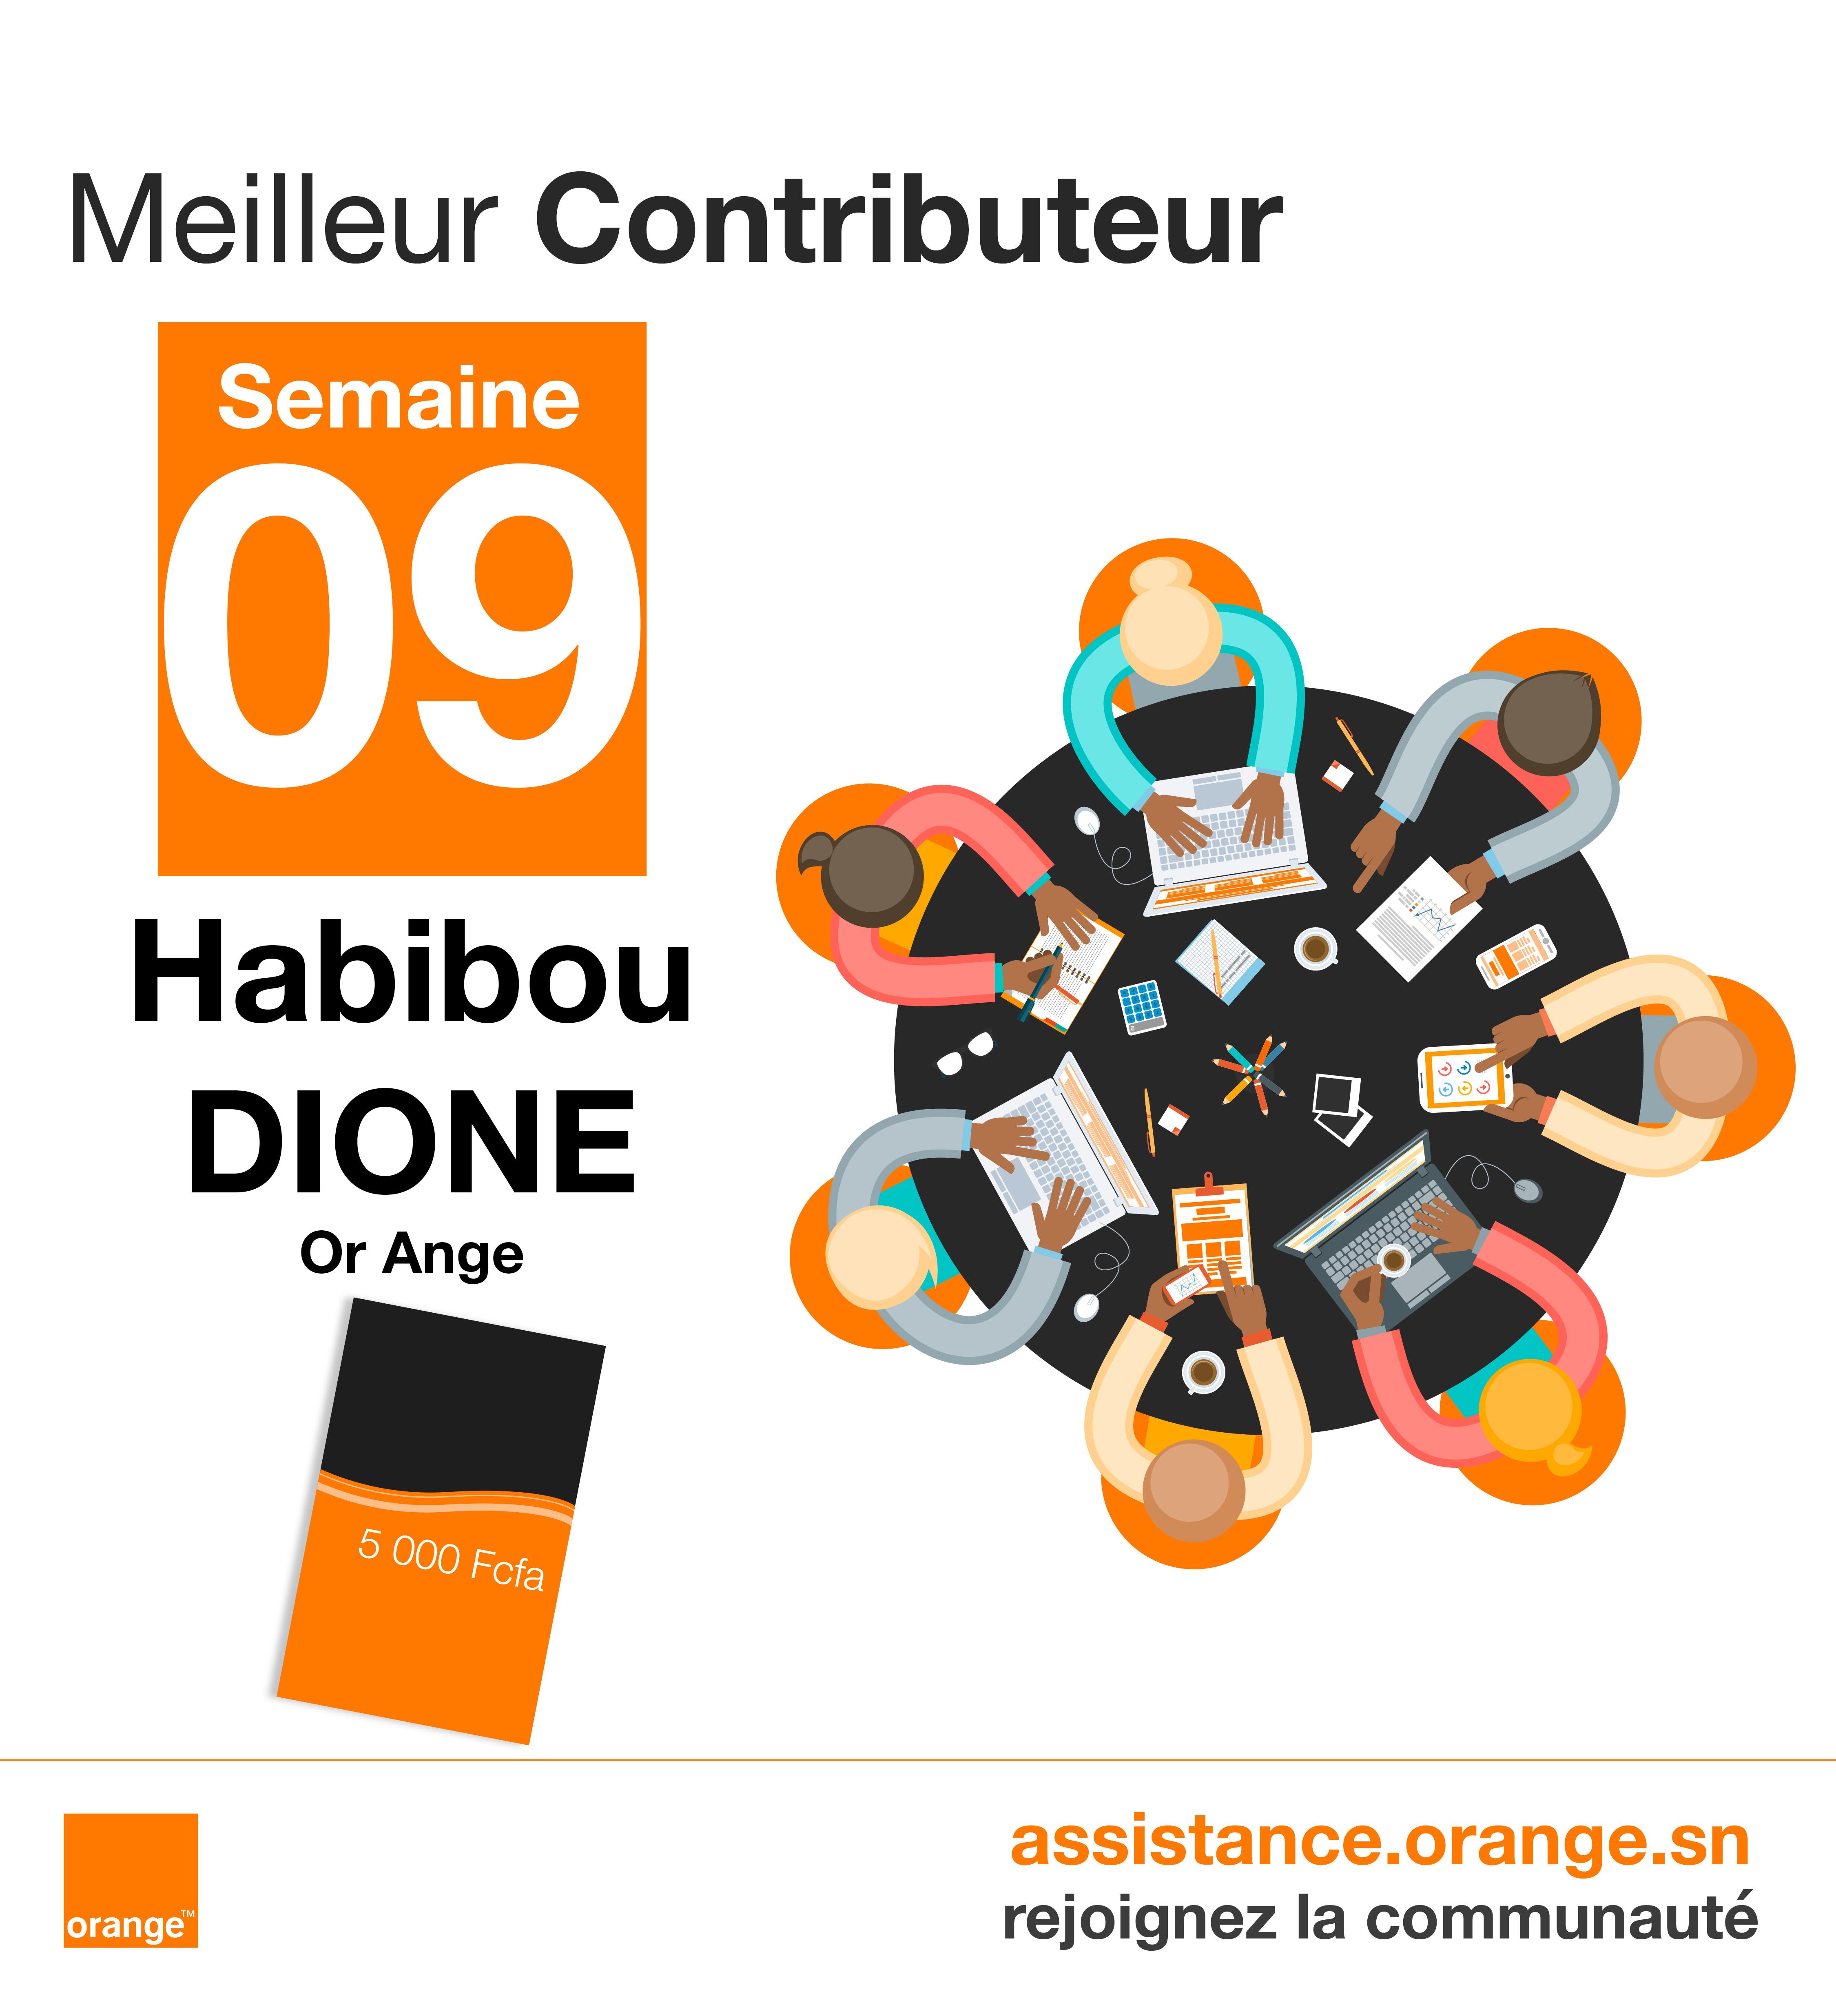 top contributeur semaine 09.jpg